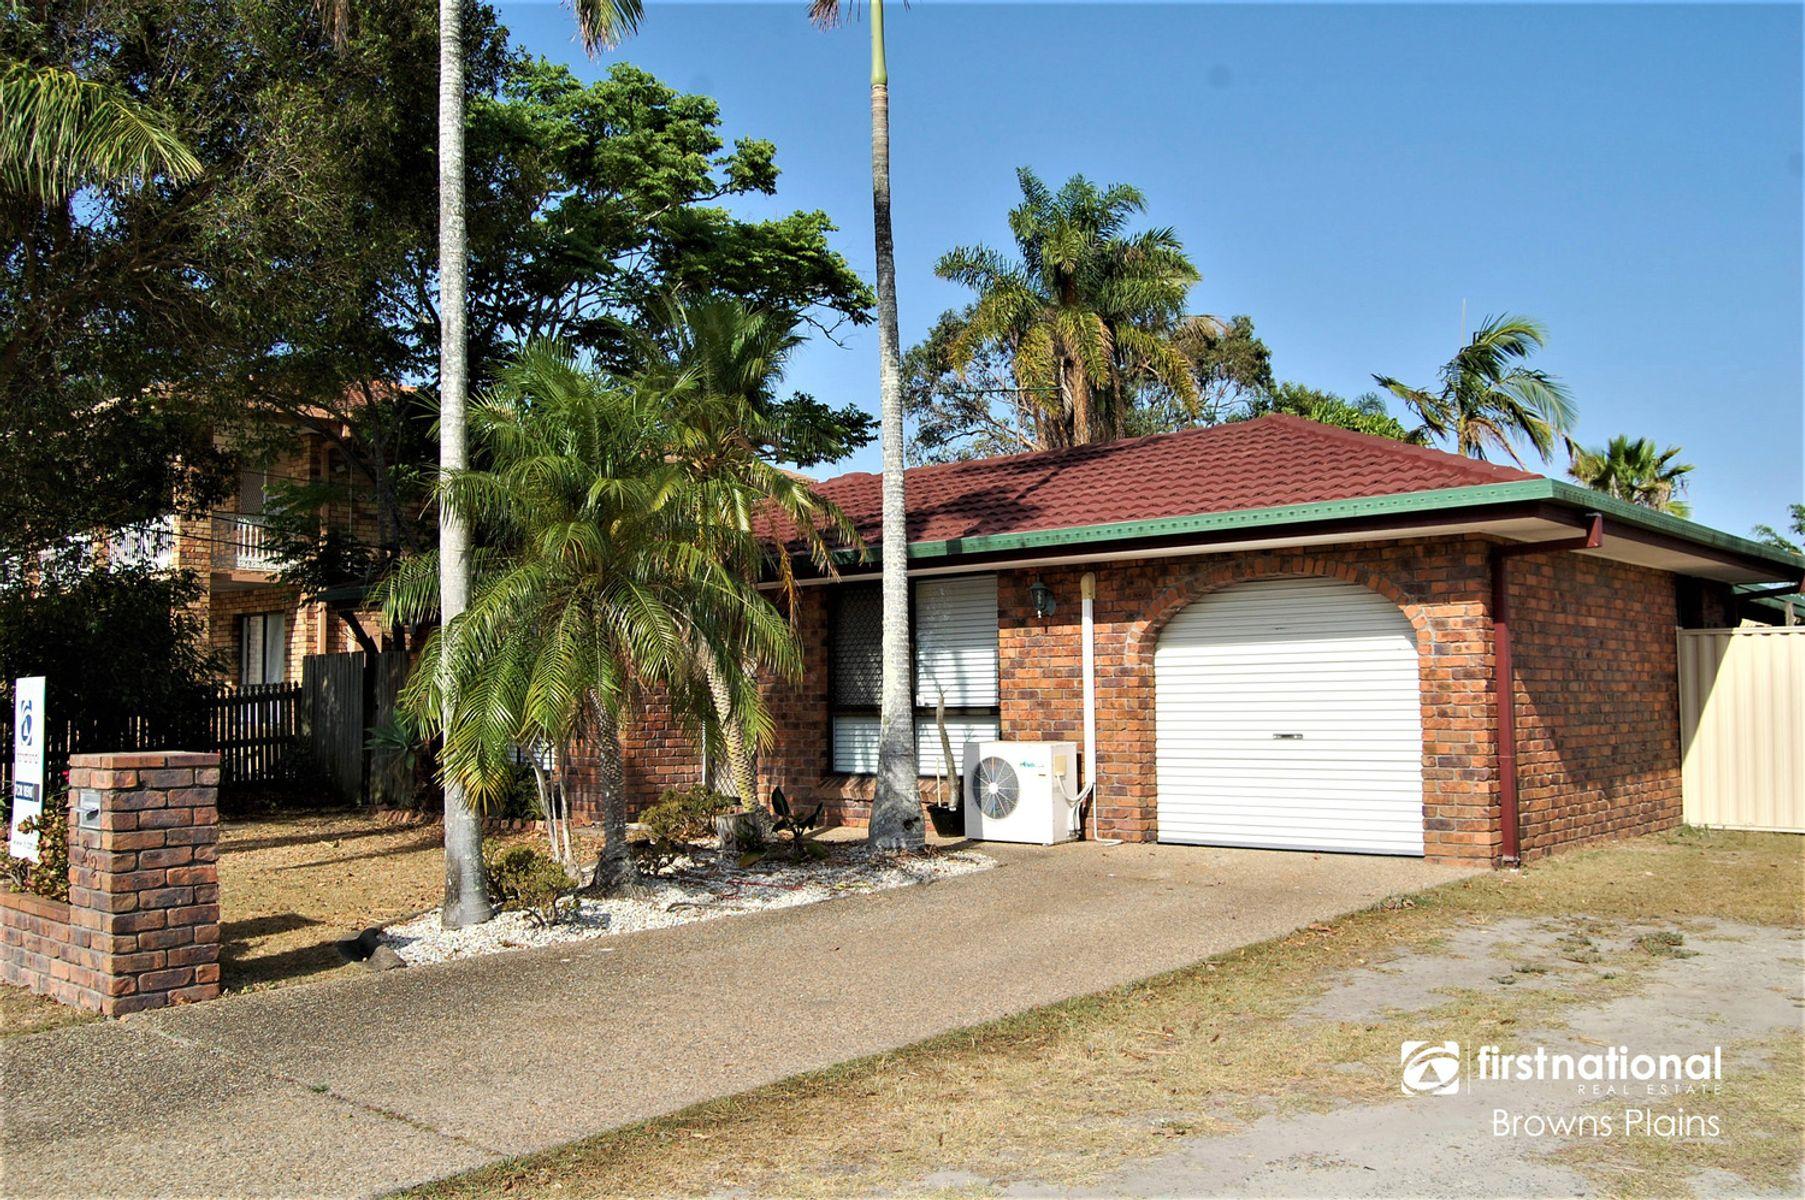 22 Straight Drive, Browns Plains, QLD 4118